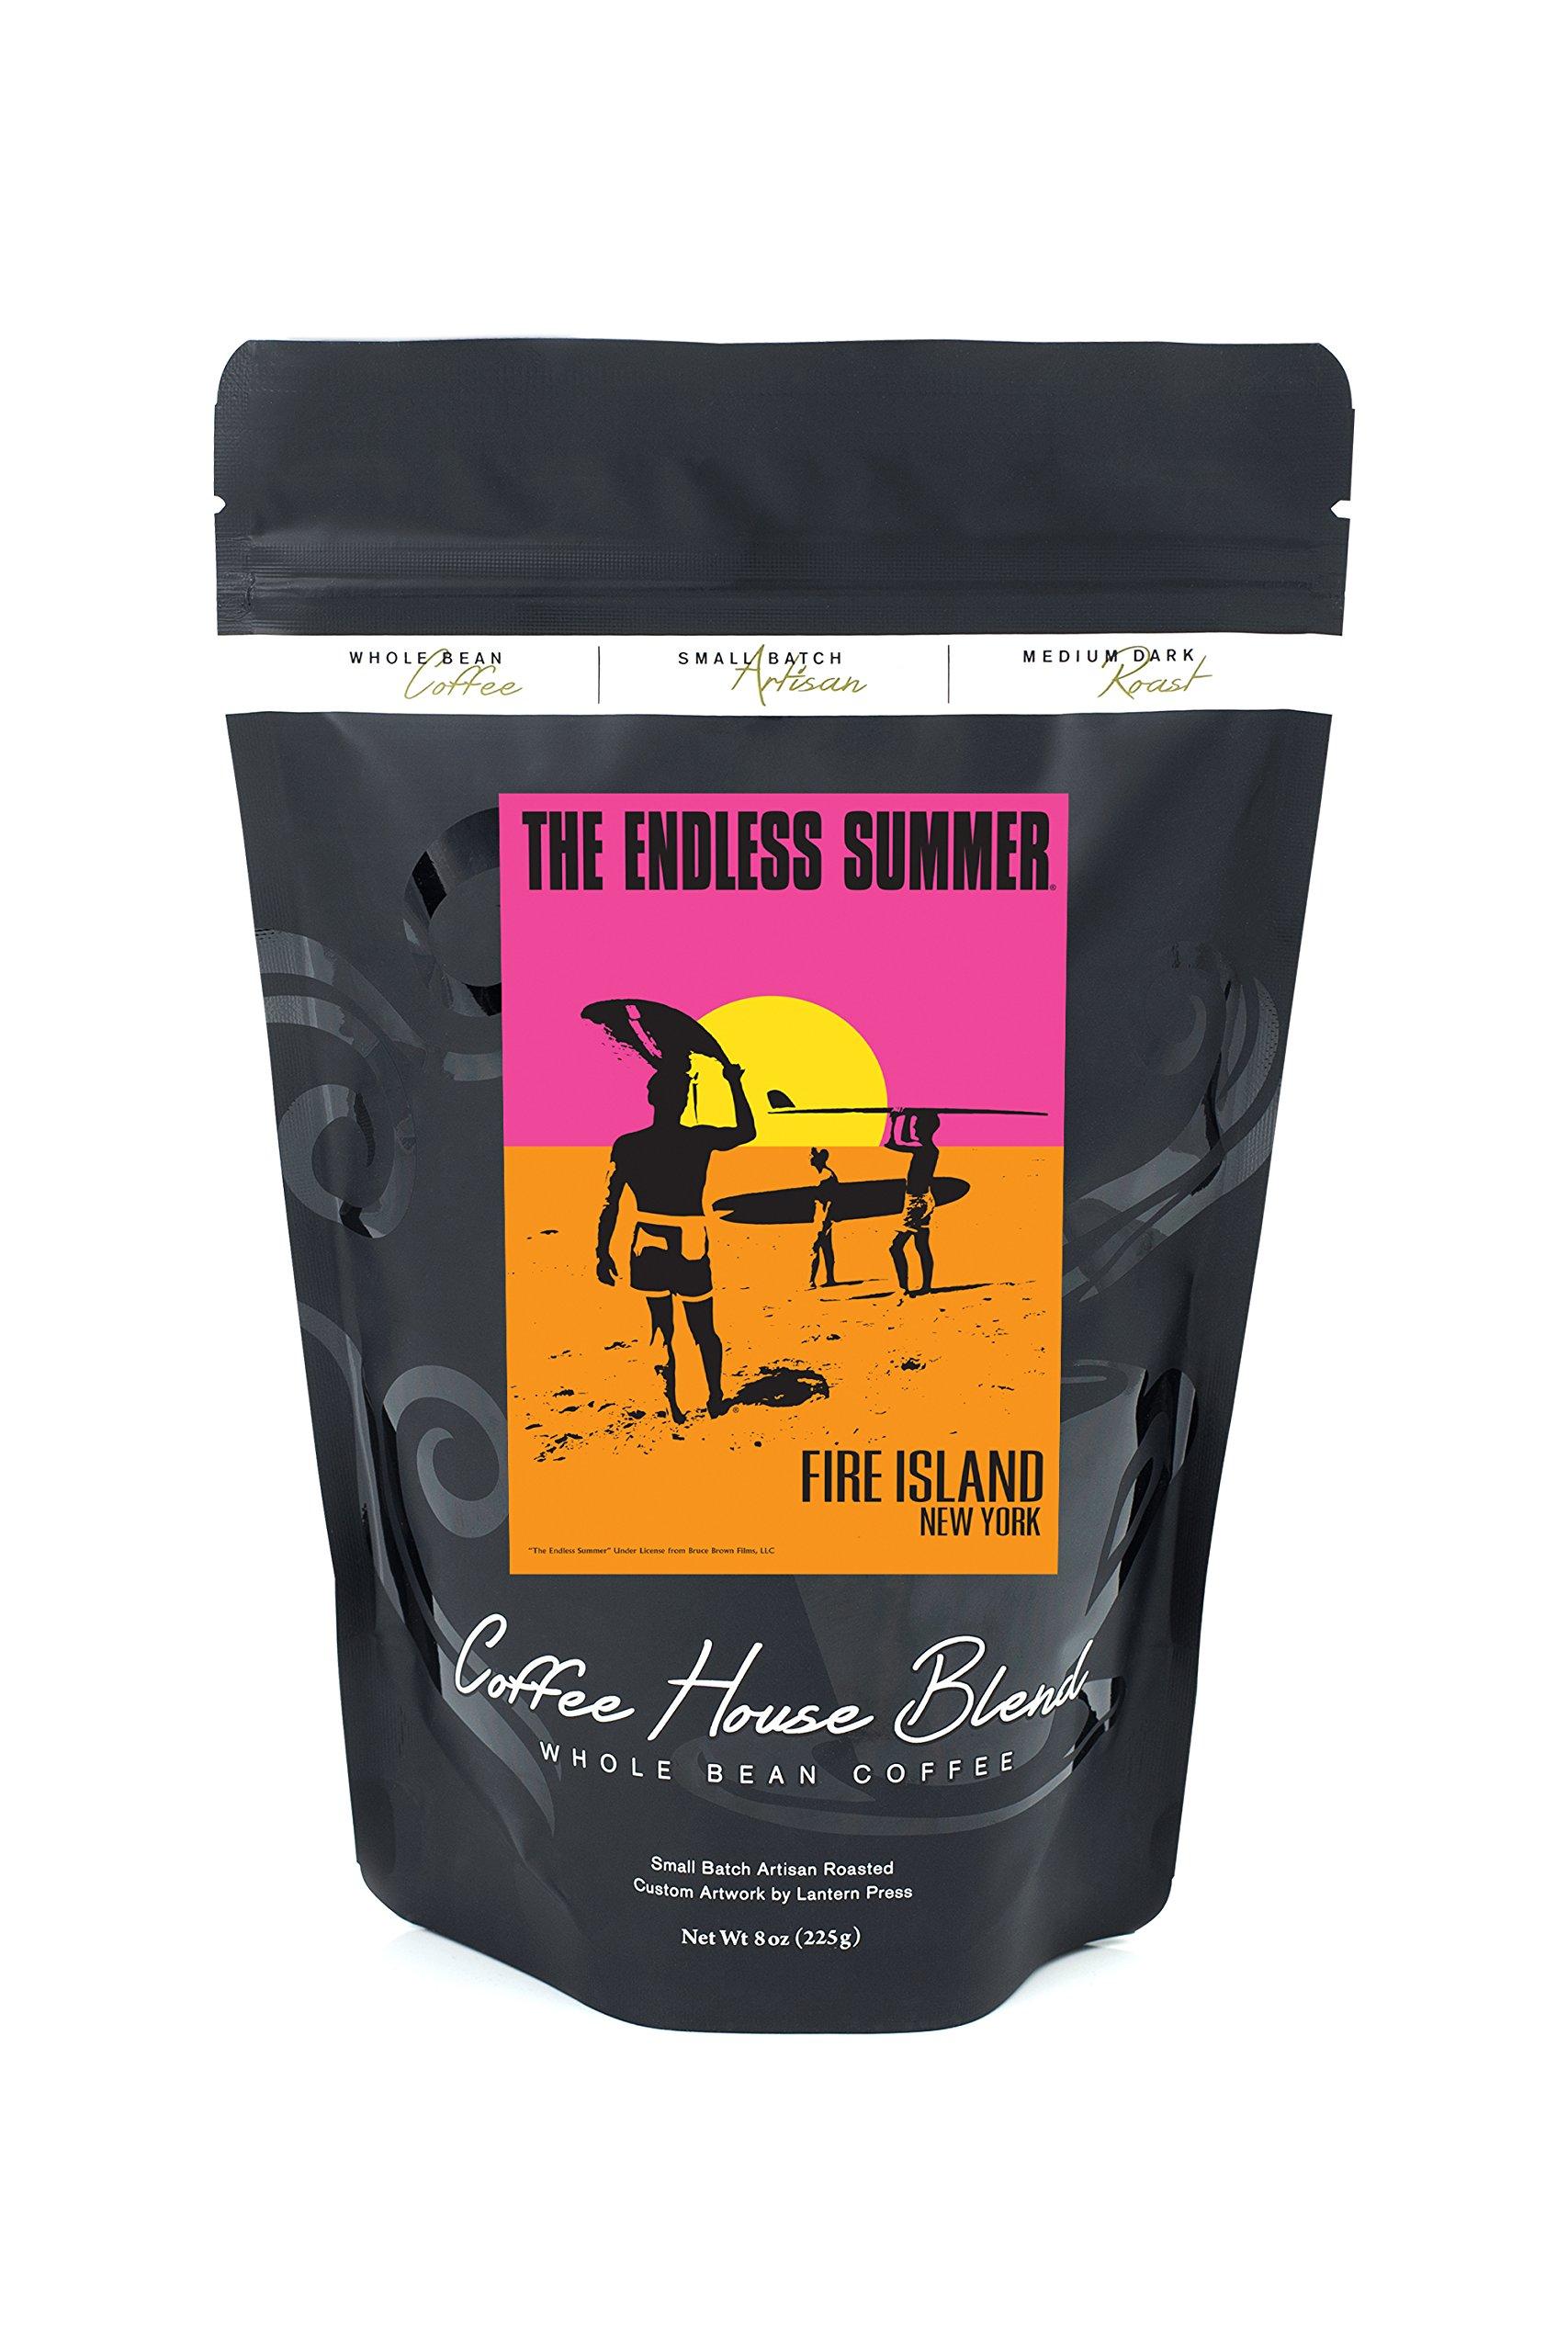 Fire Island, New York - The Endless Summer - Original Movie Poster (8oz Whole Bean Small Batch Artisan Coffee - Bold & Strong Medium Dark Roast w/ Artwork)